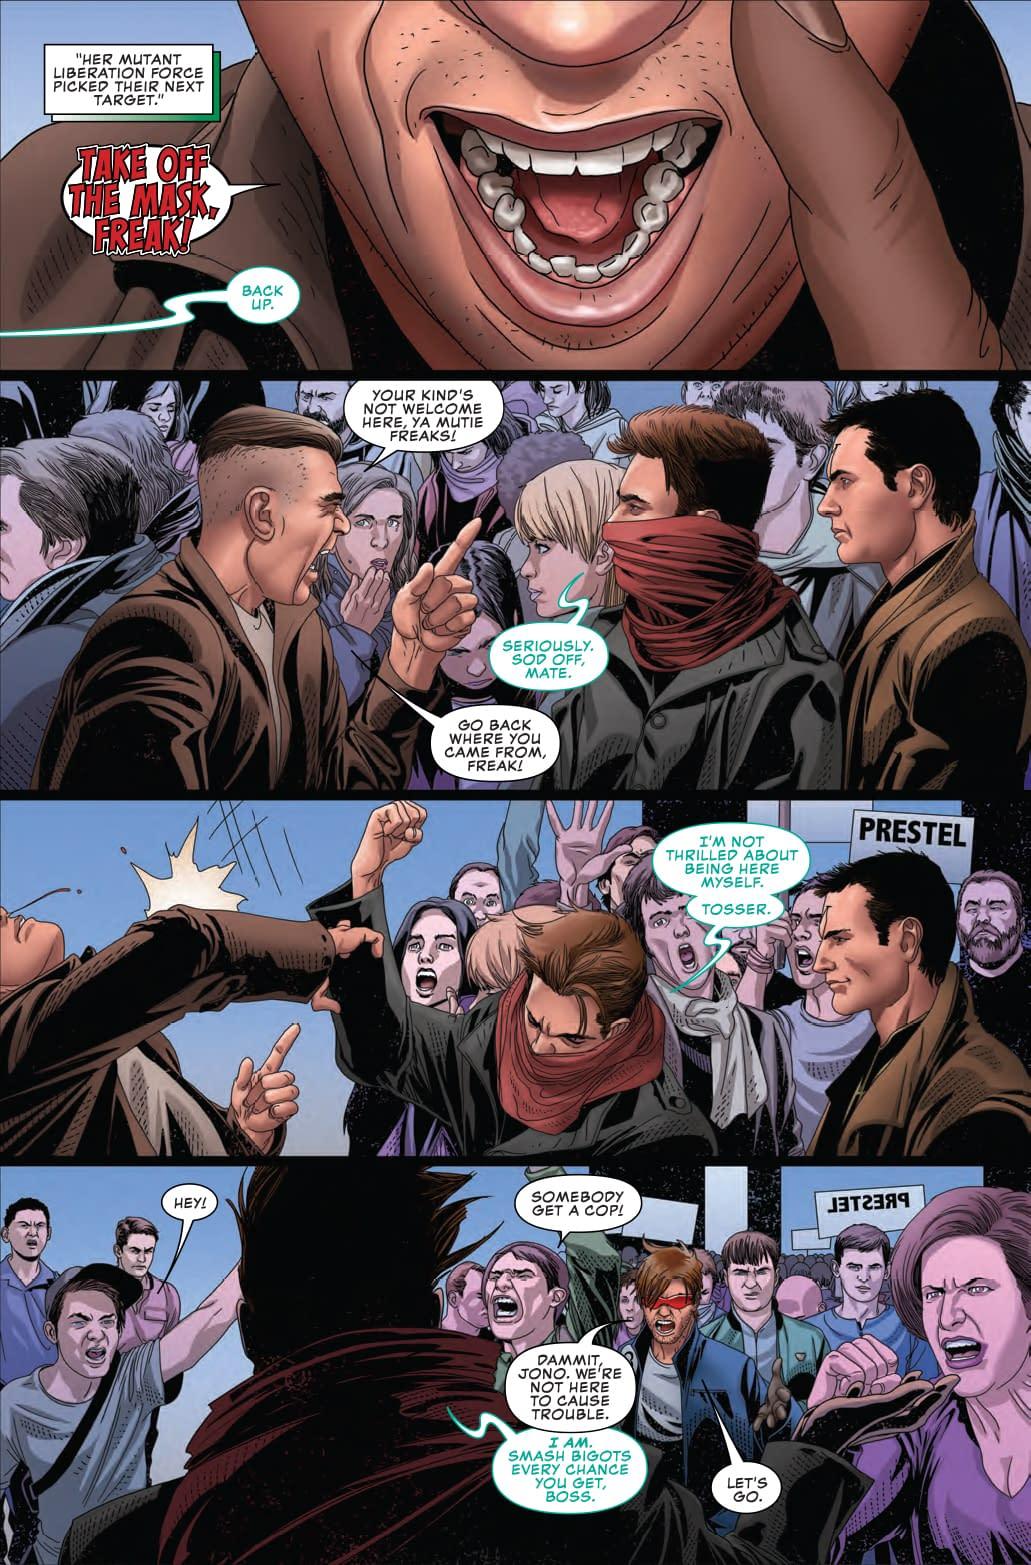 The Audacity of Captain America in Next Week's Uncanny X-Men #15